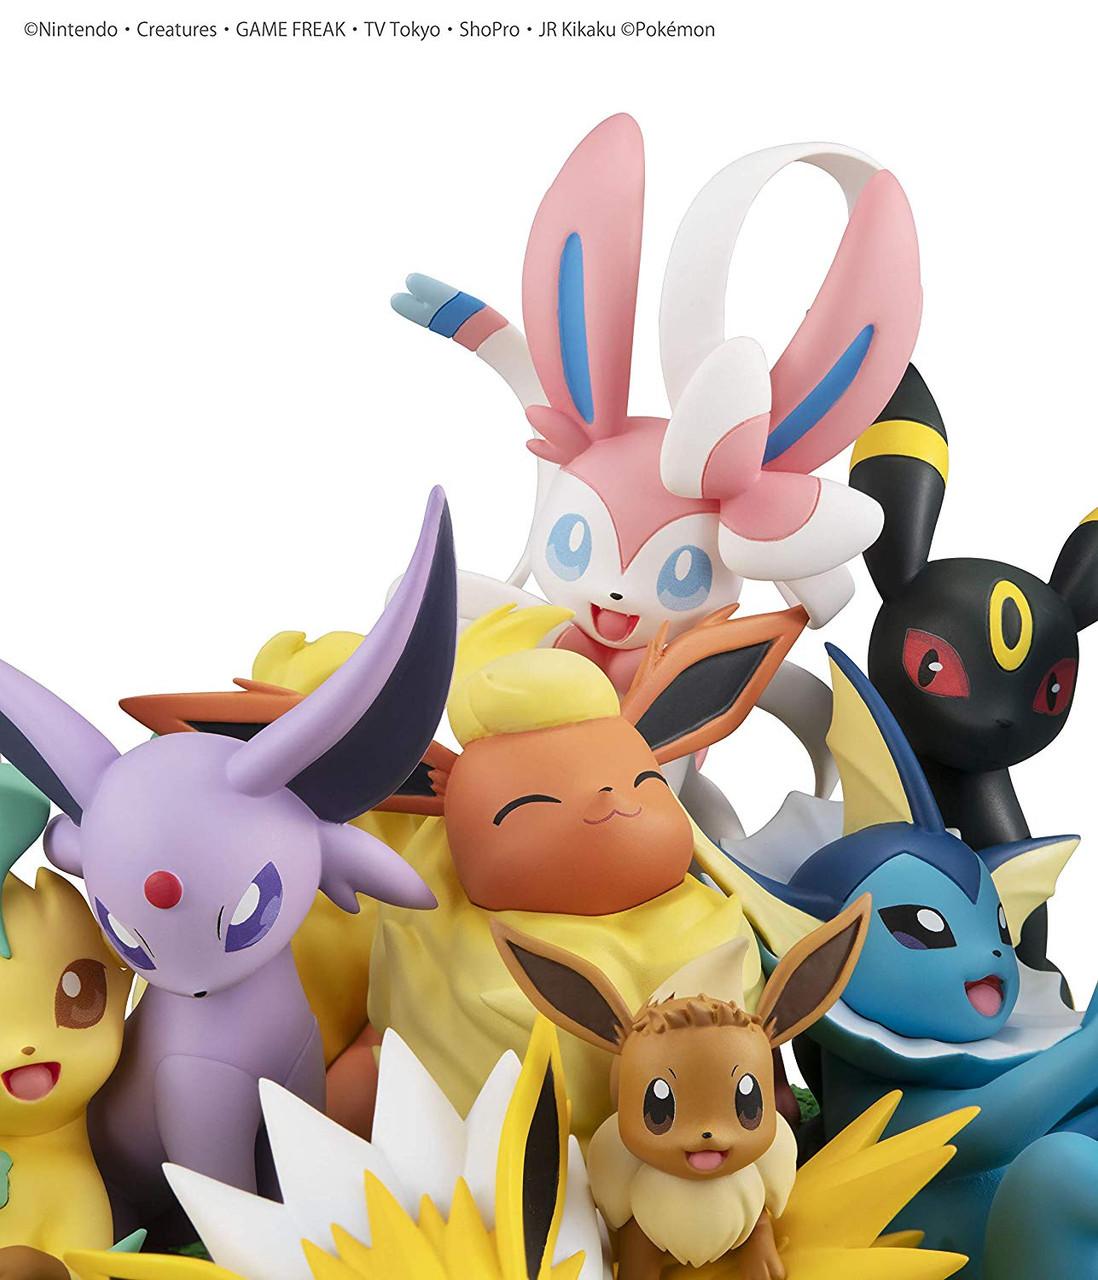 MegaHouse G.E.M.EX Series Pokemon Eevee Friends Complete Figures